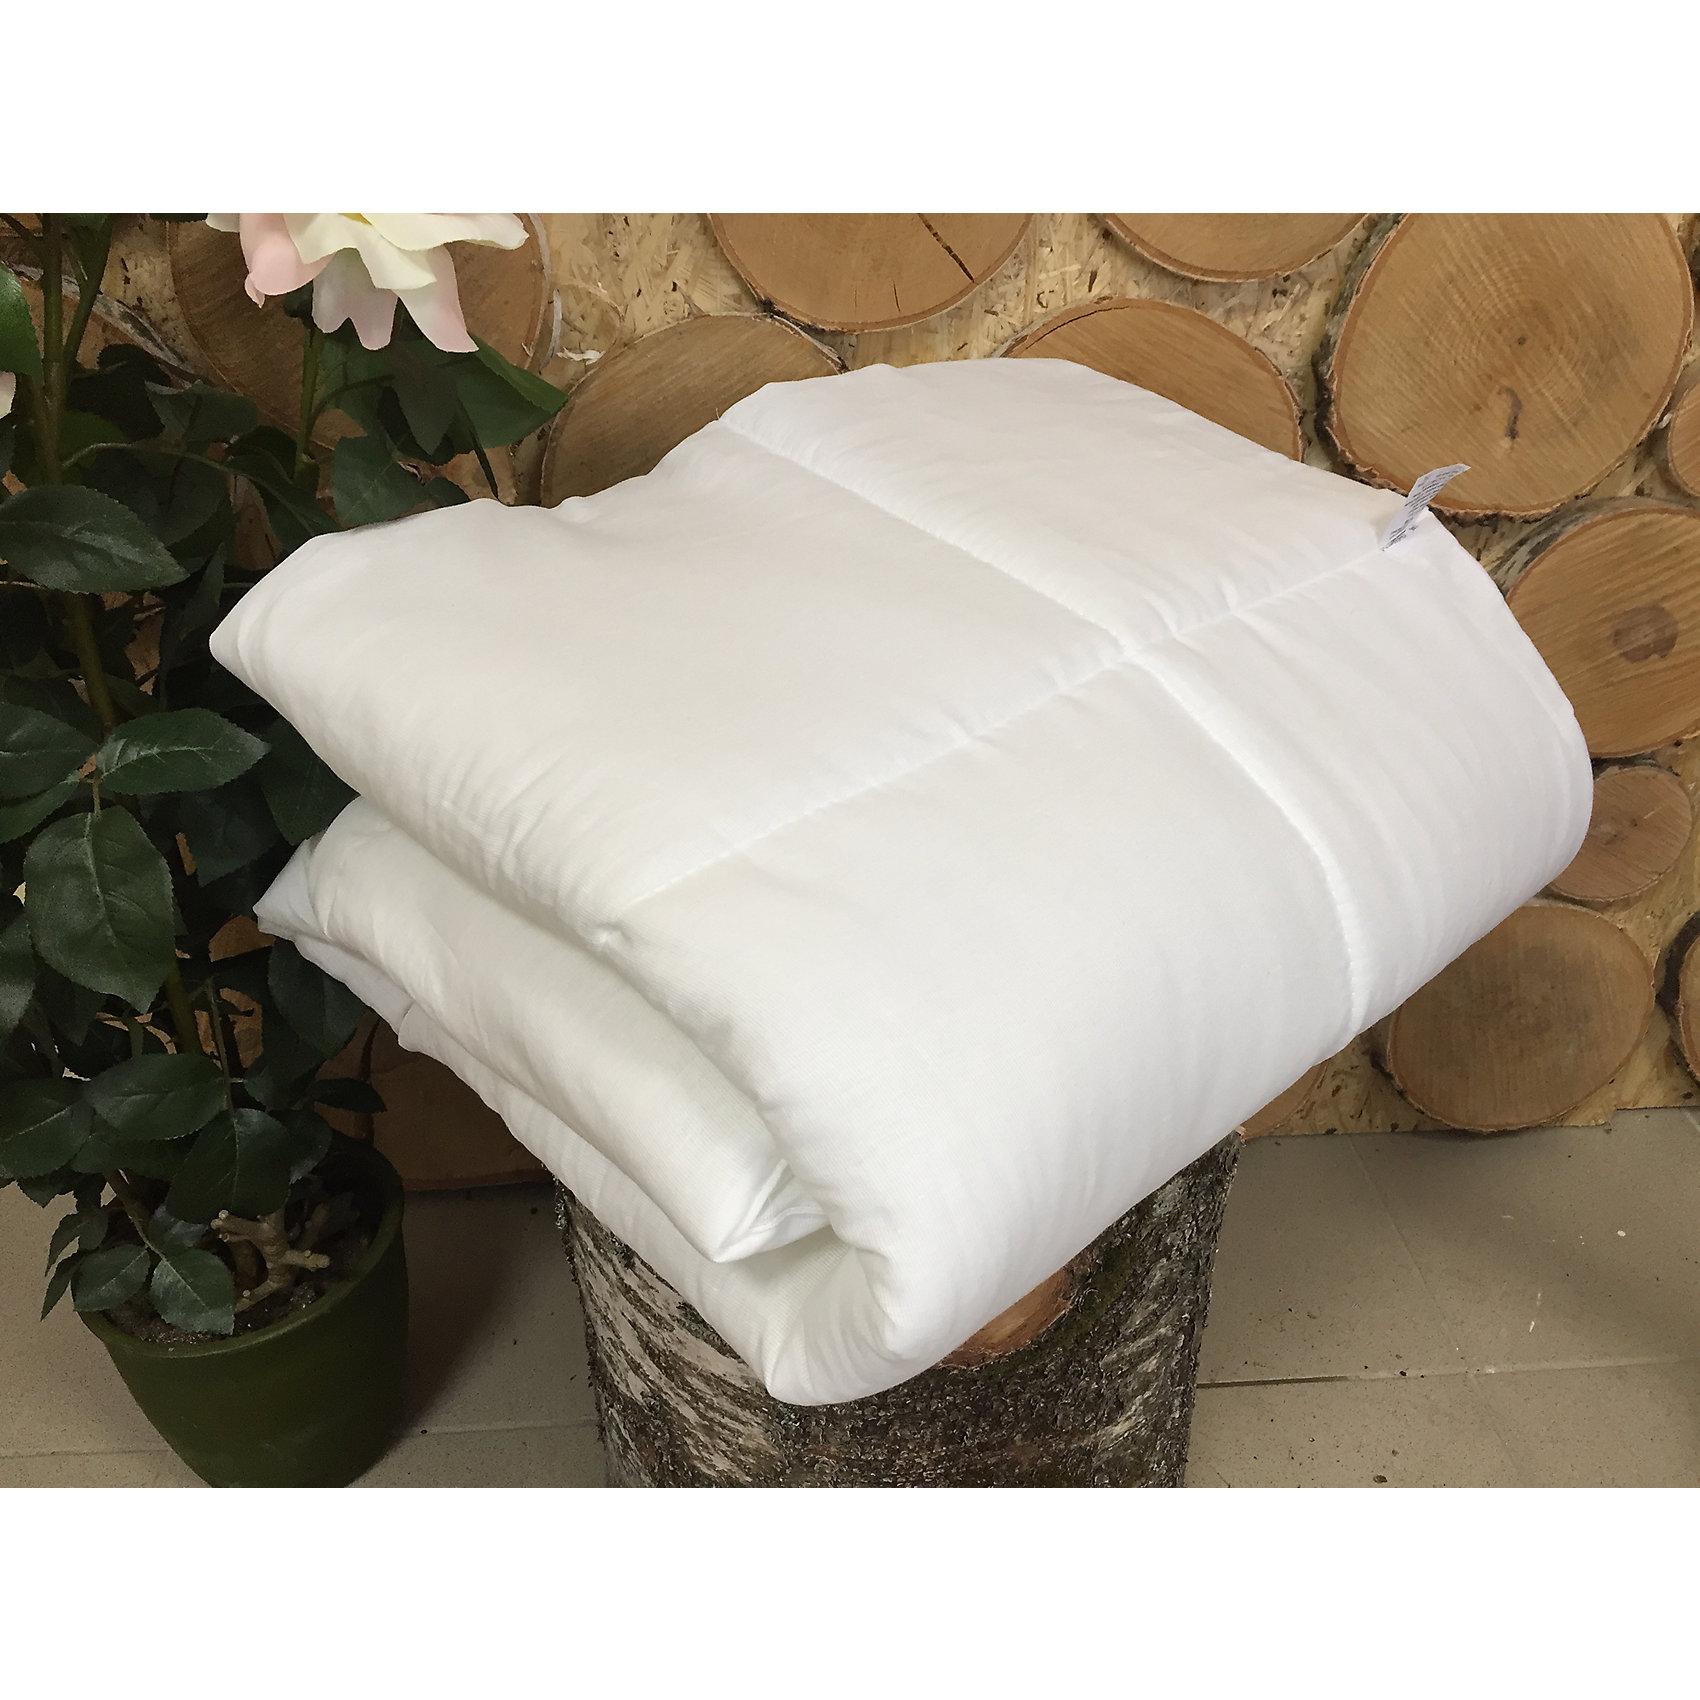 Одеяло белое из ситца,синтепон,  р-р110х140;120х120 (120*120)Одеяла, пледы<br>Одеяло белое из ситца. Наполнитель: синтепон.<br><br>Ширина мм: 600<br>Глубина мм: 380<br>Высота мм: 150<br>Вес г: 300<br>Возраст от месяцев: 0<br>Возраст до месяцев: 6<br>Пол: Унисекс<br>Возраст: Детский<br>SKU: 5465321